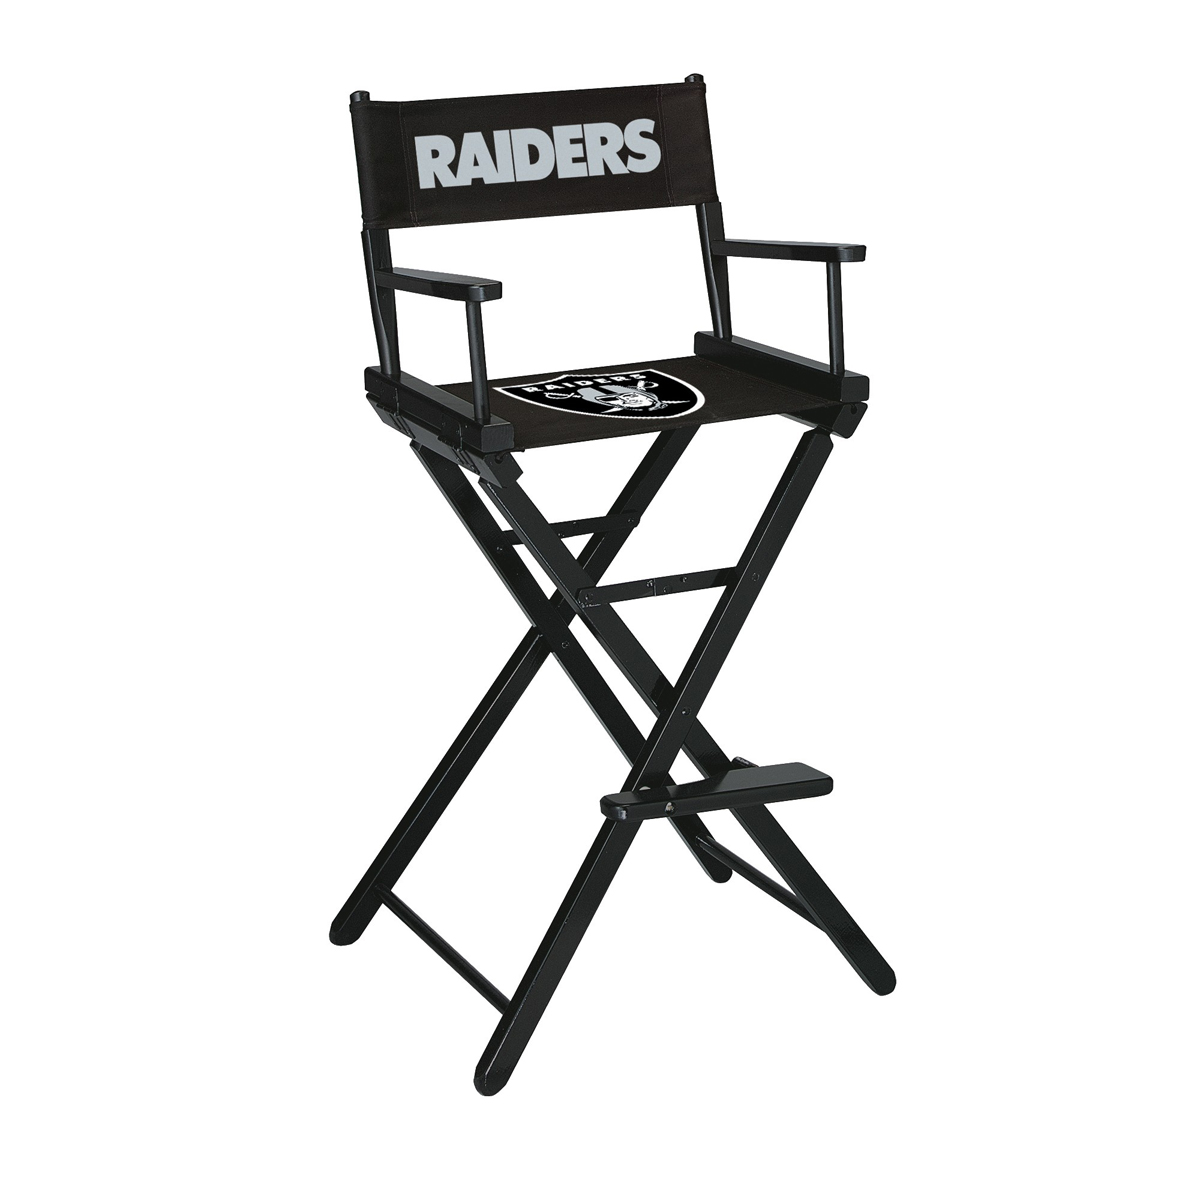 OAKLAND RAIDERS BAR HEIGHT DIRECTORS CHAIR